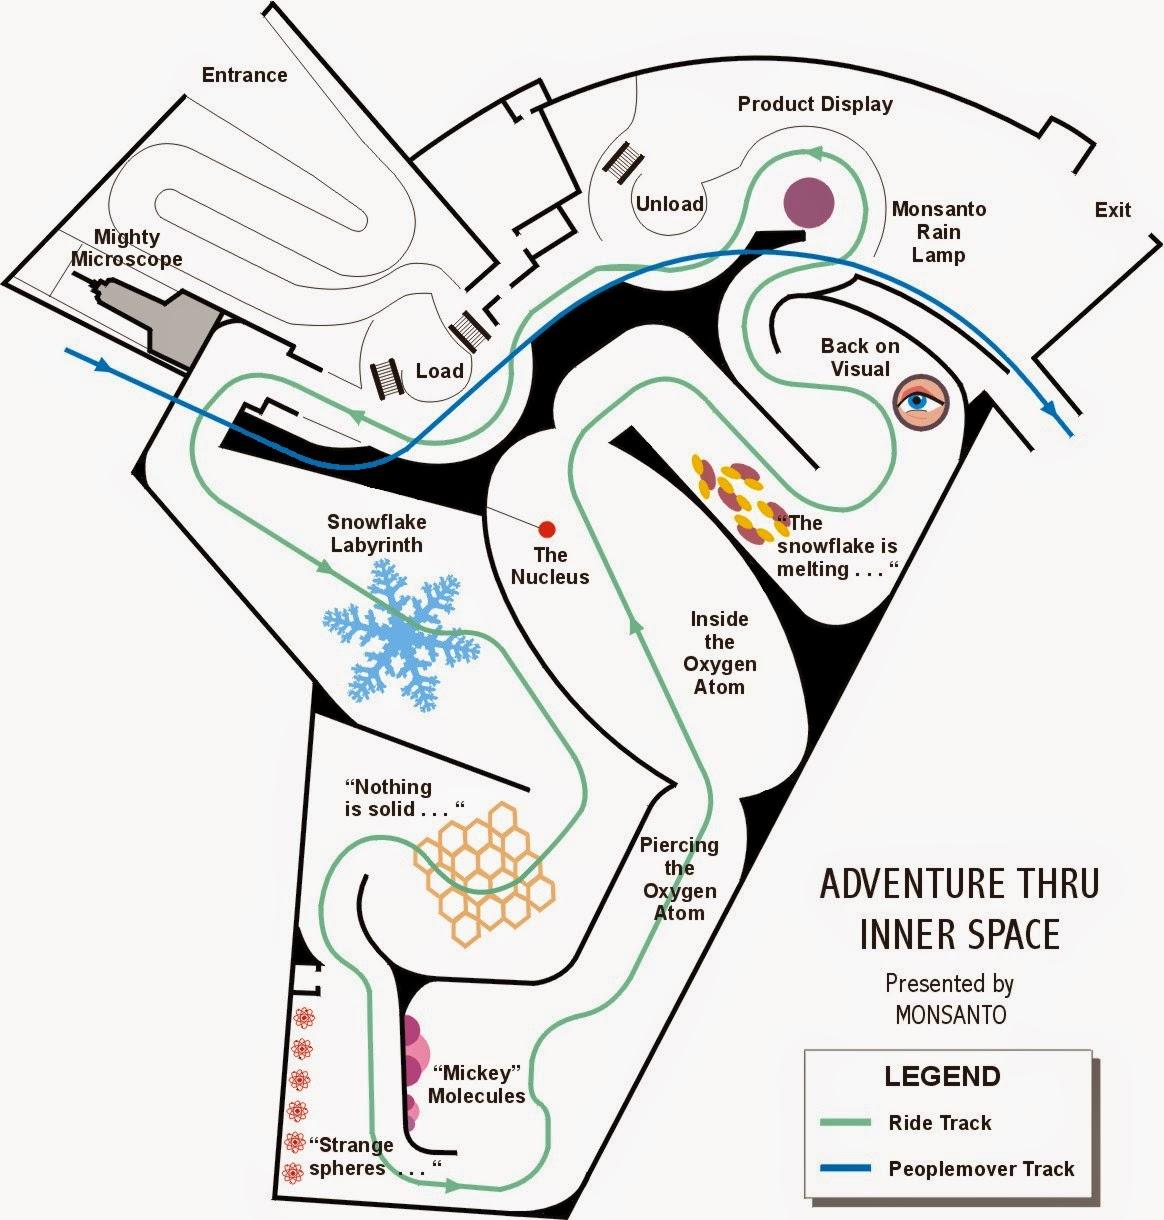 Disney Avenue Making Of Adventure Thru Inner Space